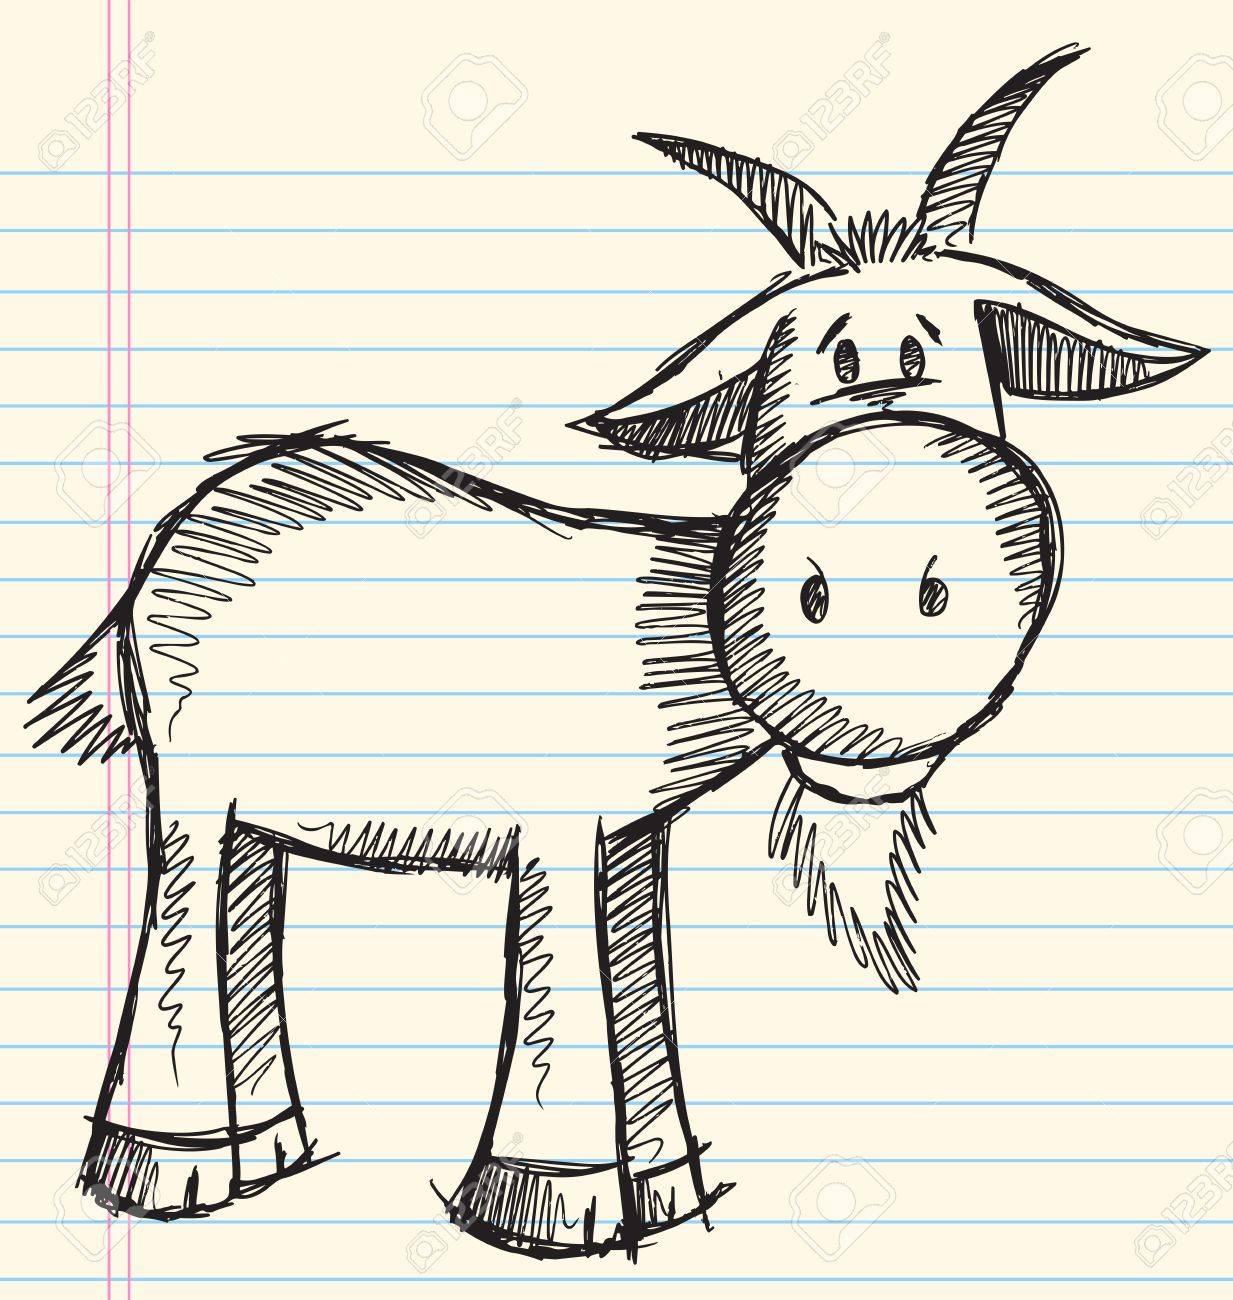 Doodle Sketch Goat Vector Illustration Stock Vector - 13110913